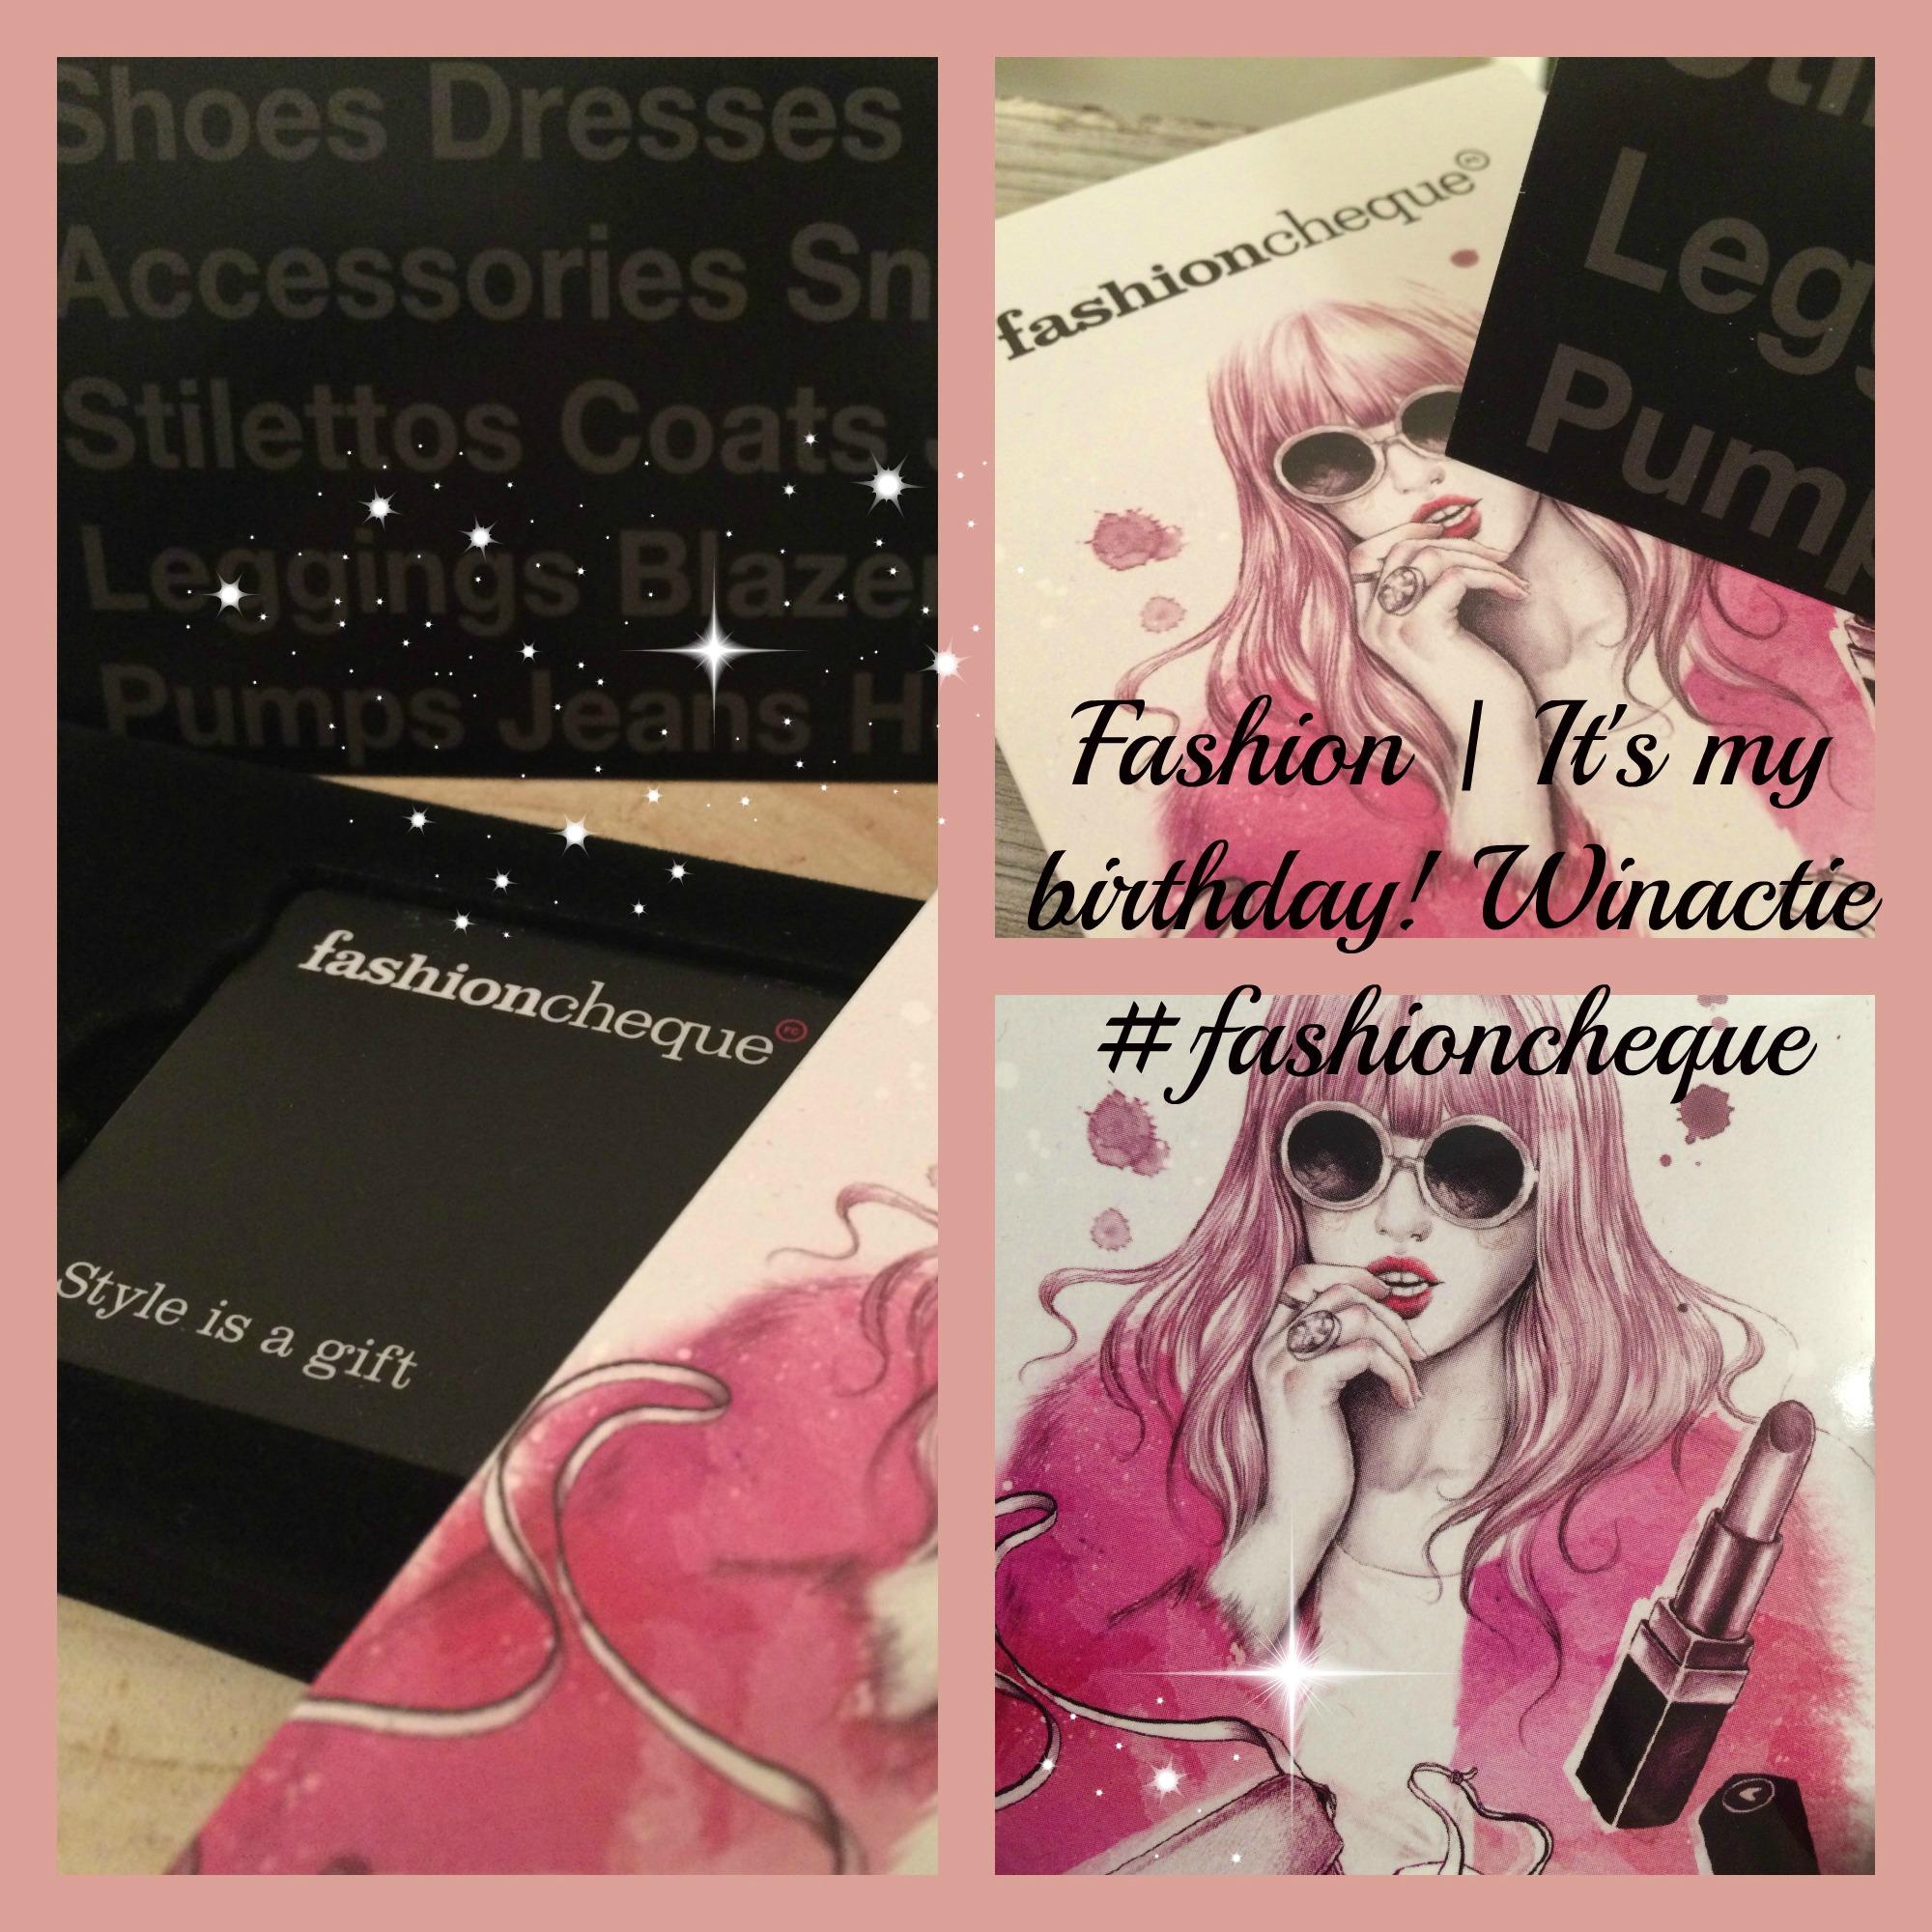 Fashion | It's my birthday & winactie! #fashioncheque